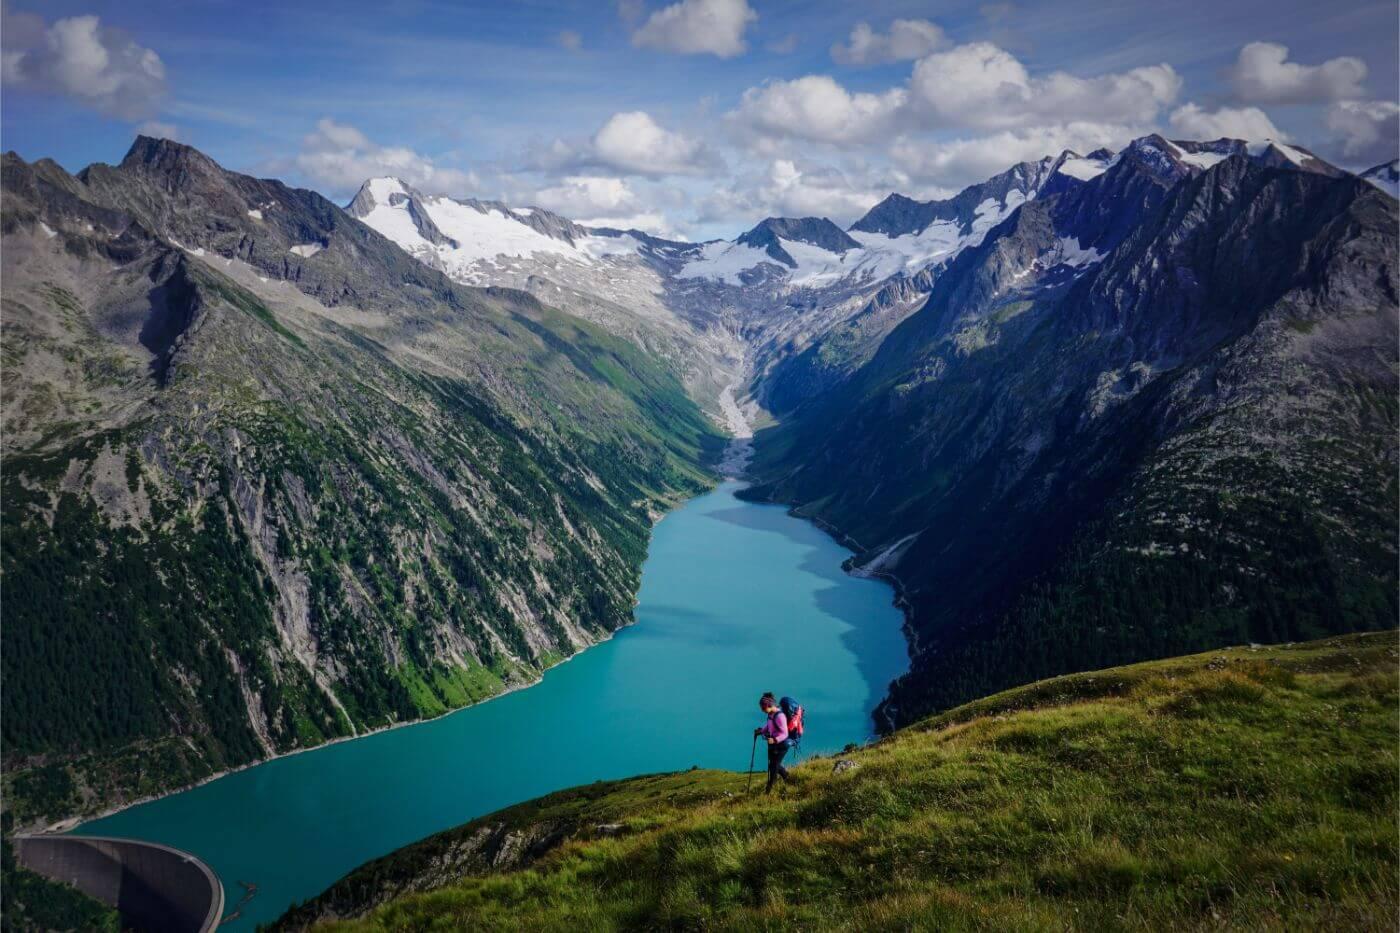 Berlin High Trail, Austria - Best Hikes in Europe